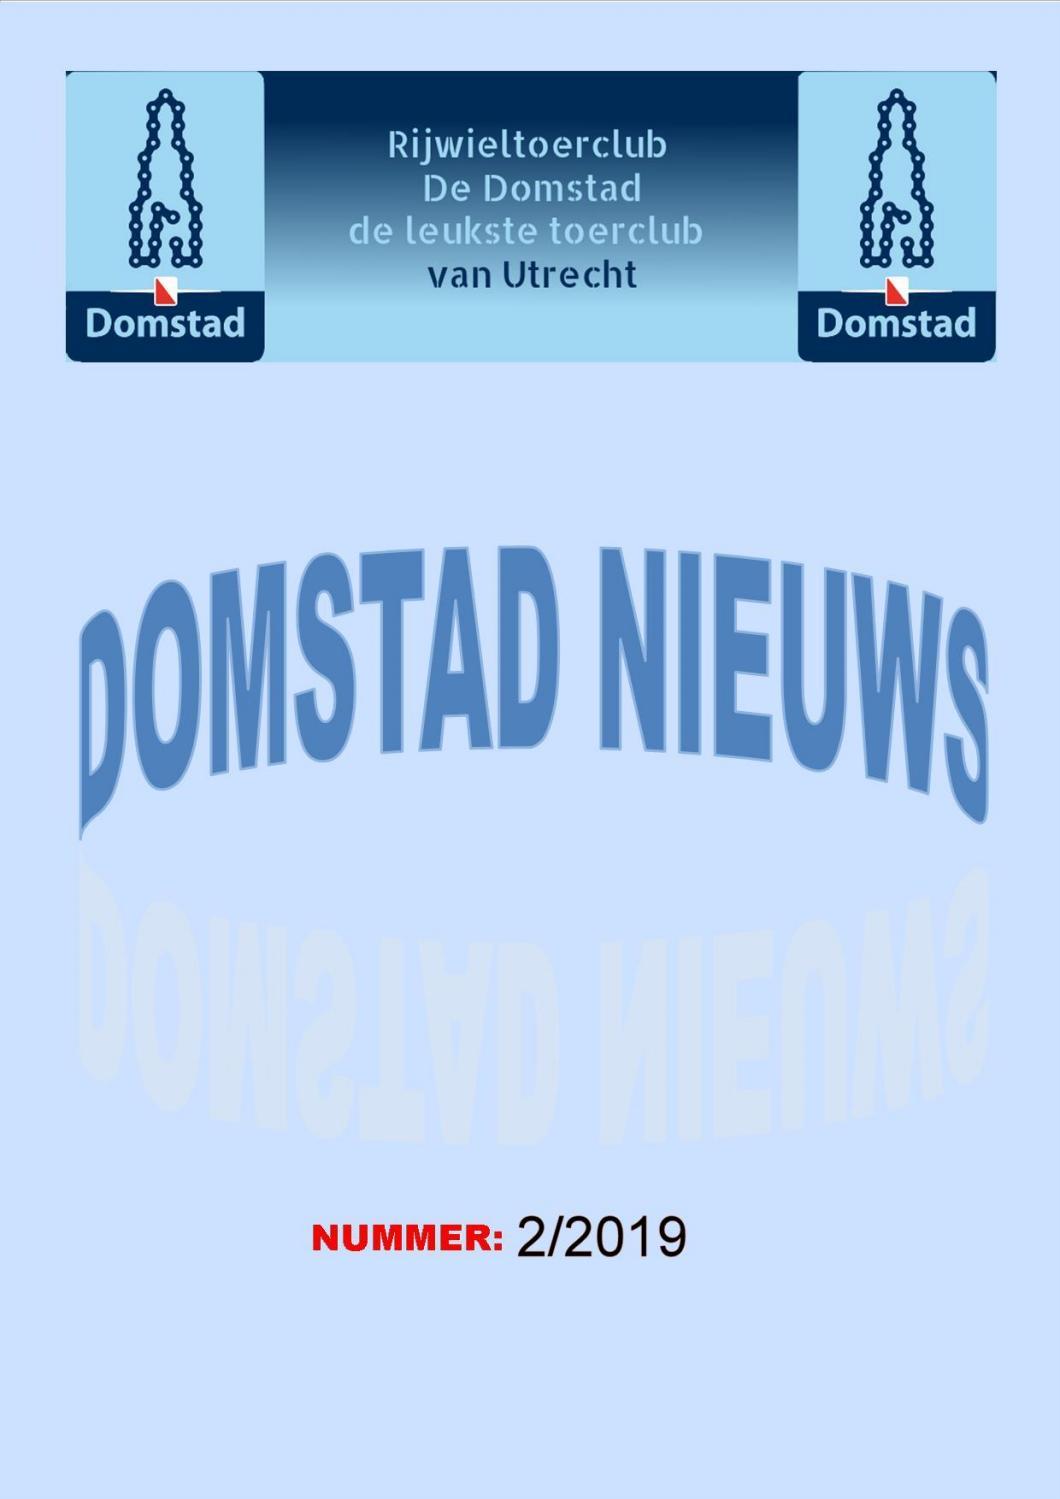 Domstad Nieuws Nummer 2 2019 By Rtc De Domstad Issuu